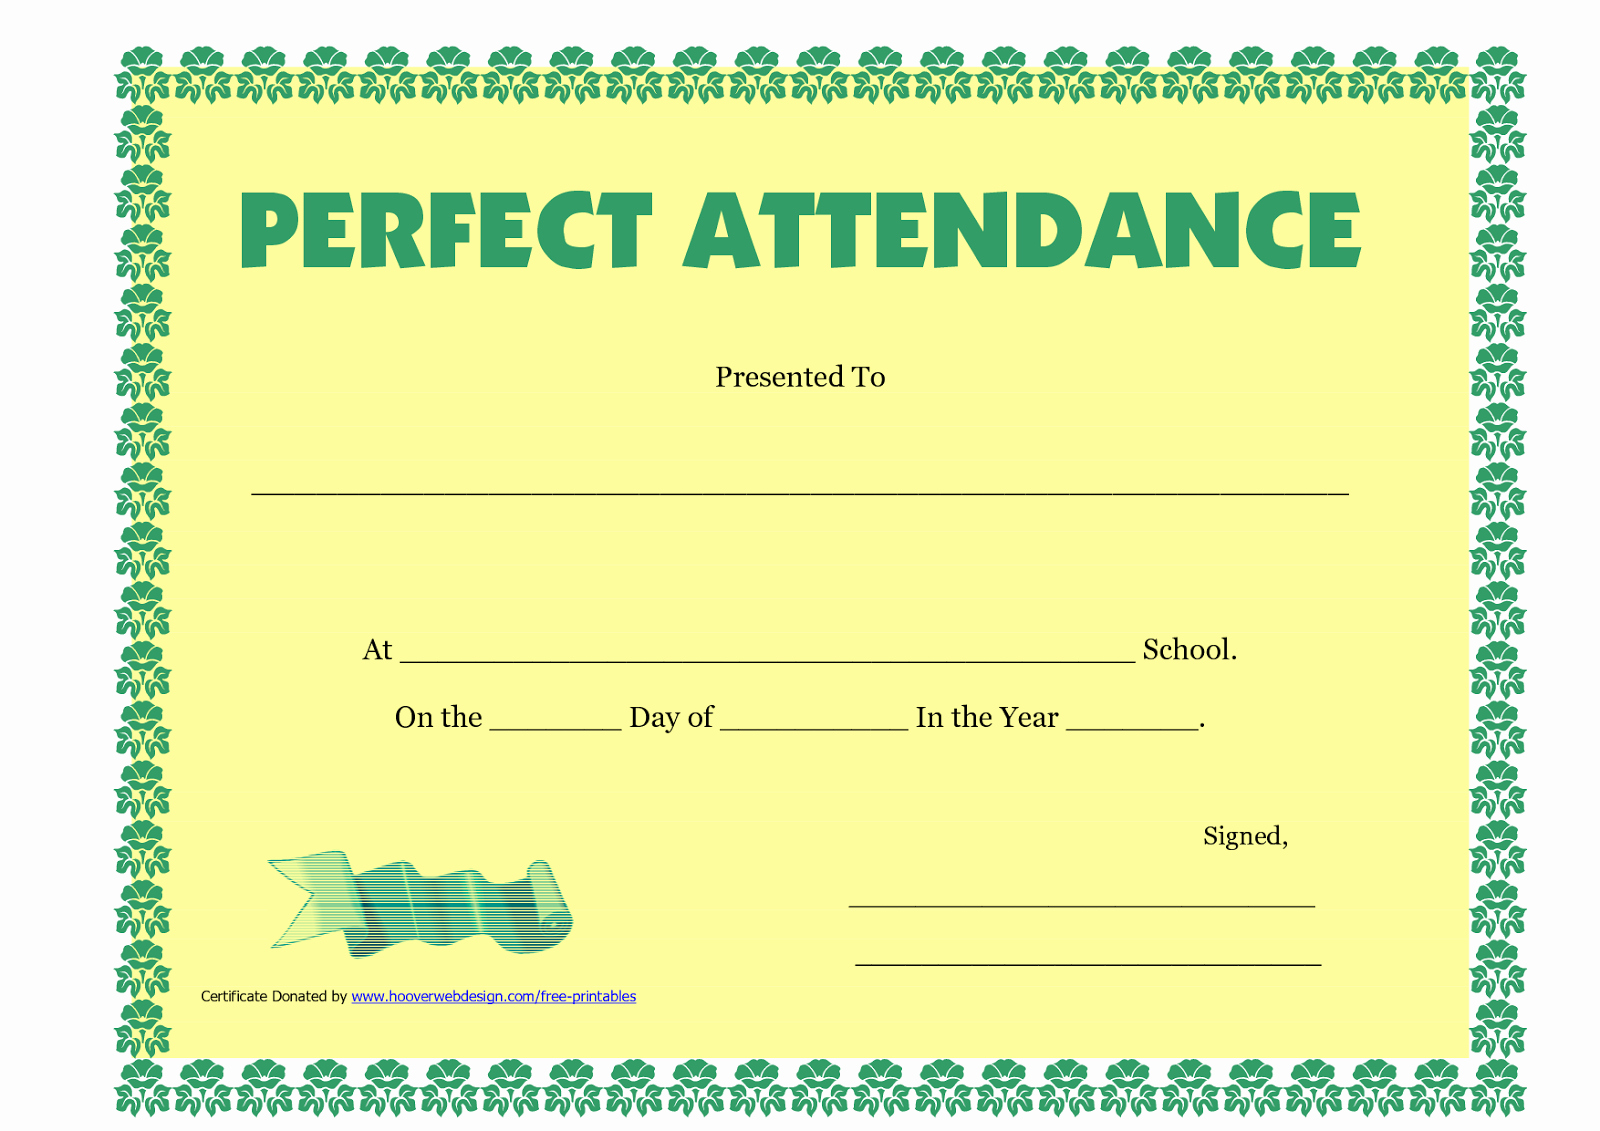 Perfect attendance Certificate Template Luxury Perfect attendance Certificate Printable Free Download